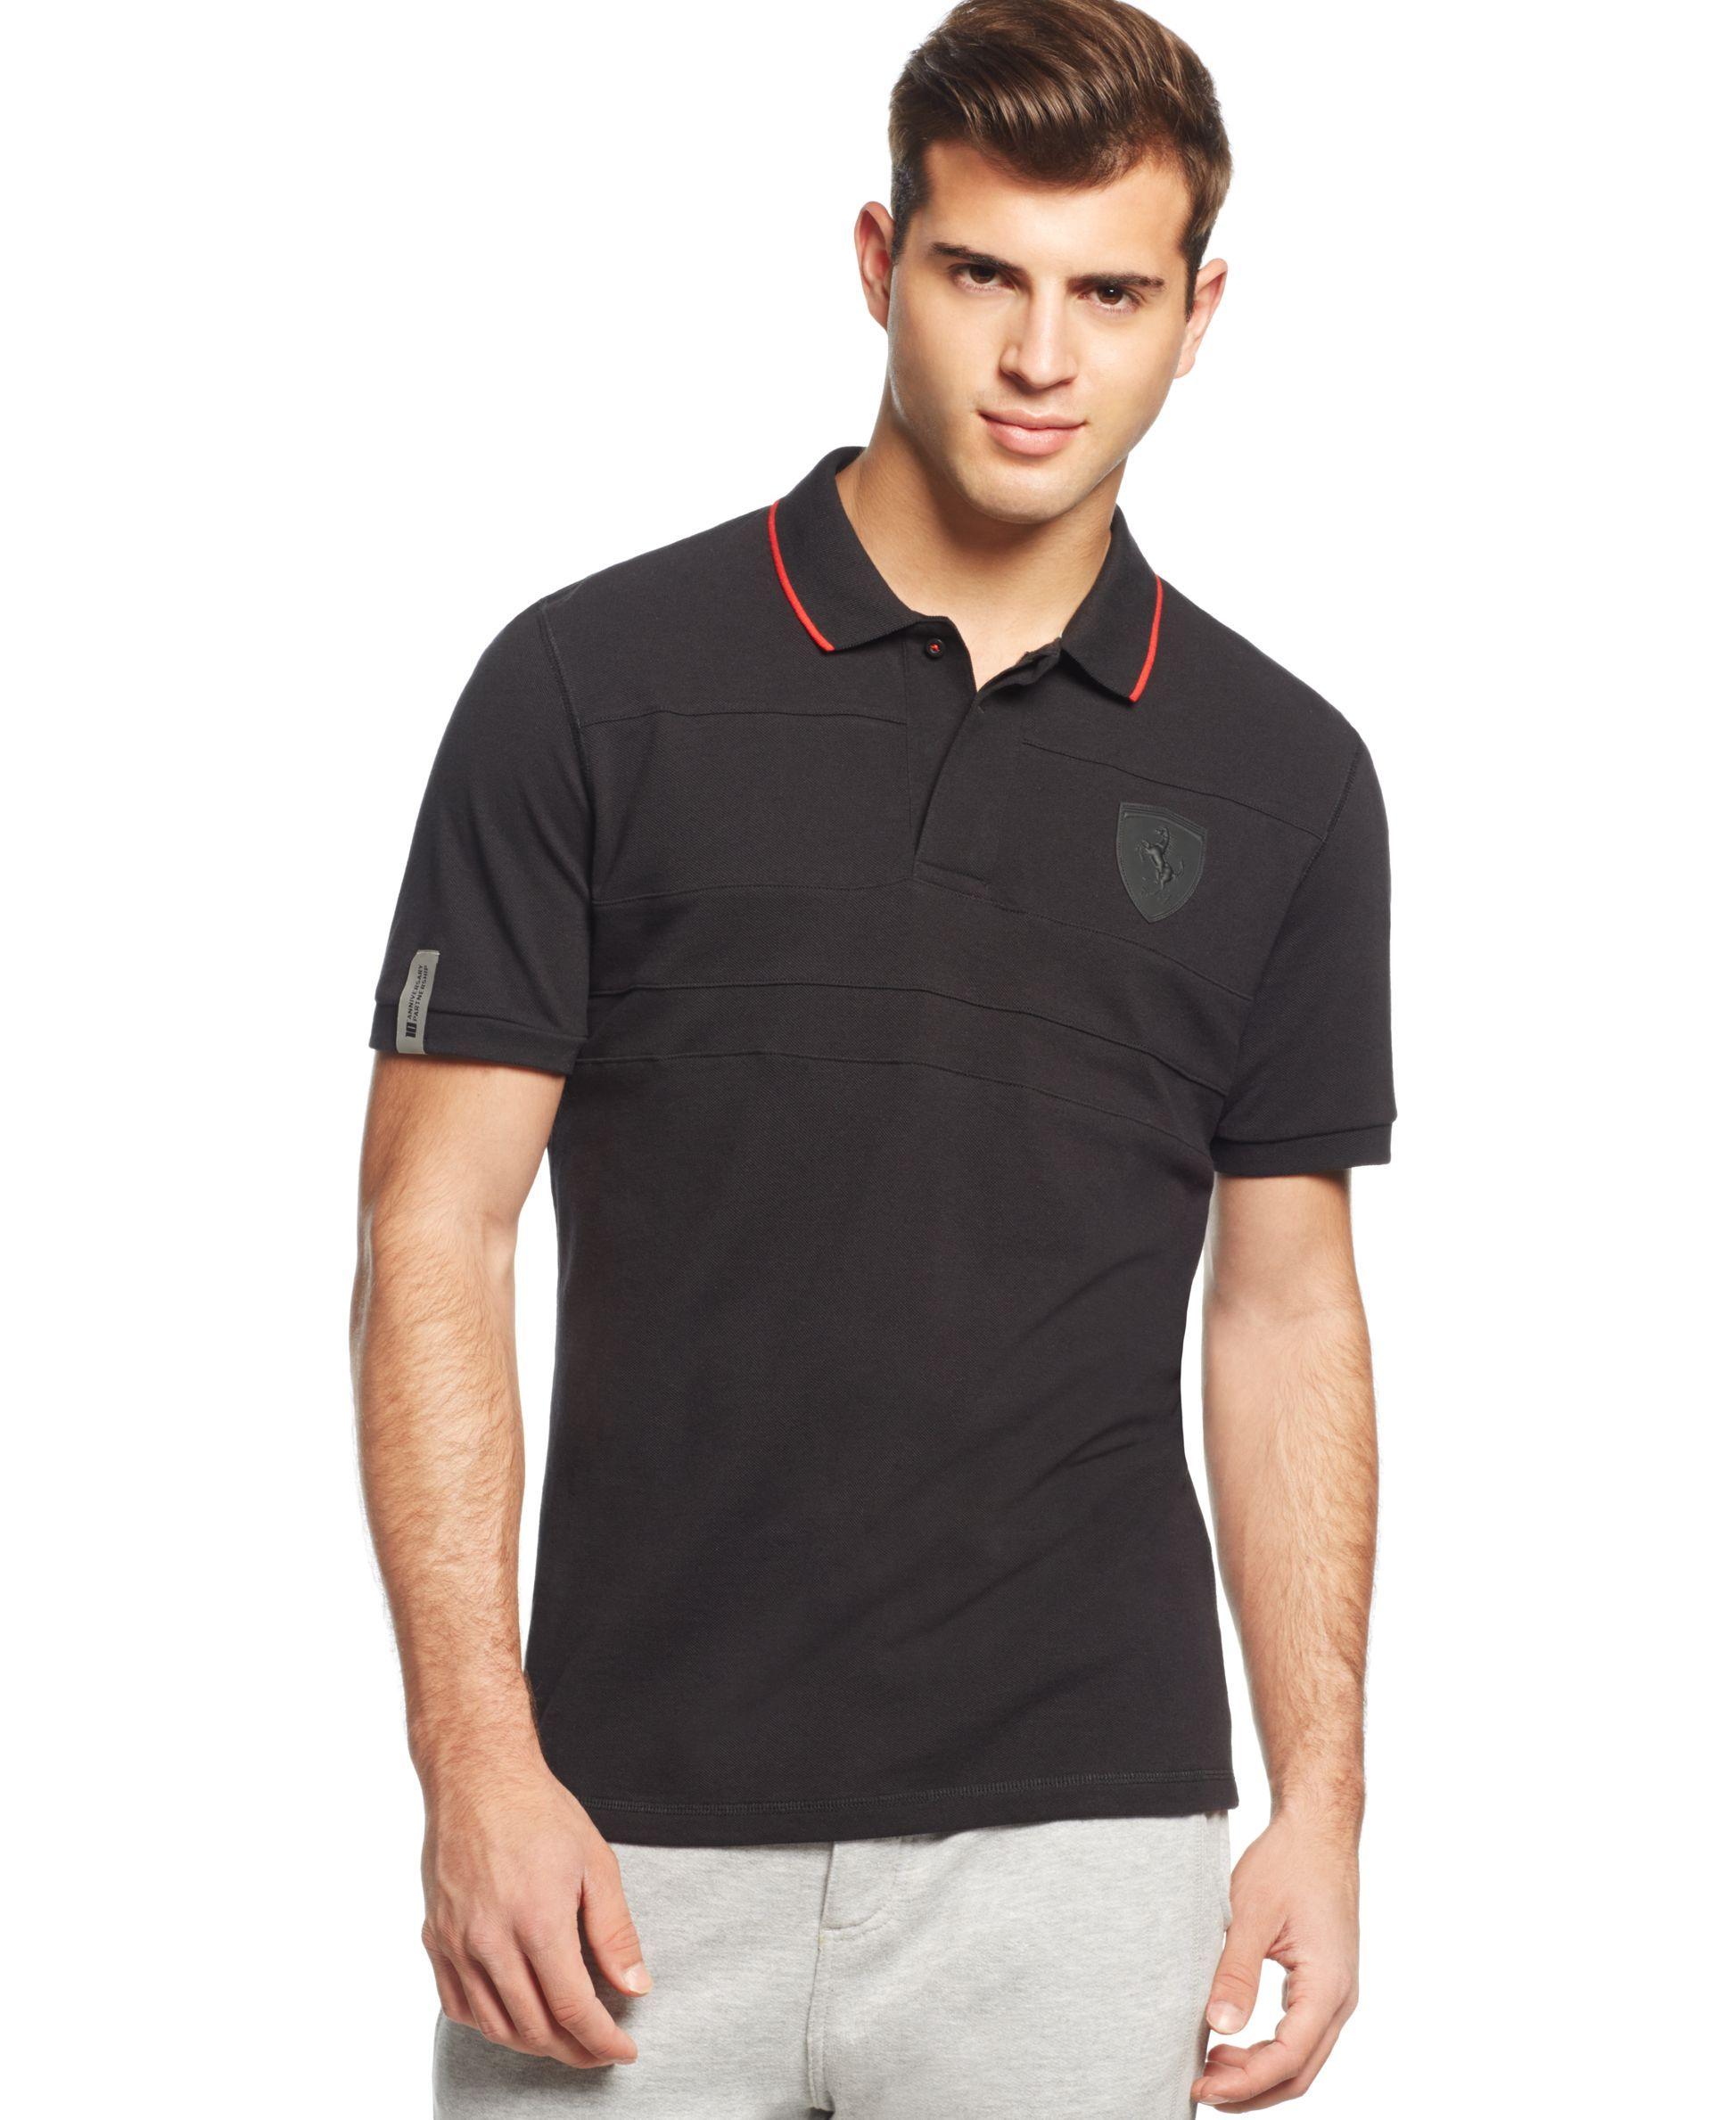 shirts s t prices on men big shirt puma shield compare ferrari